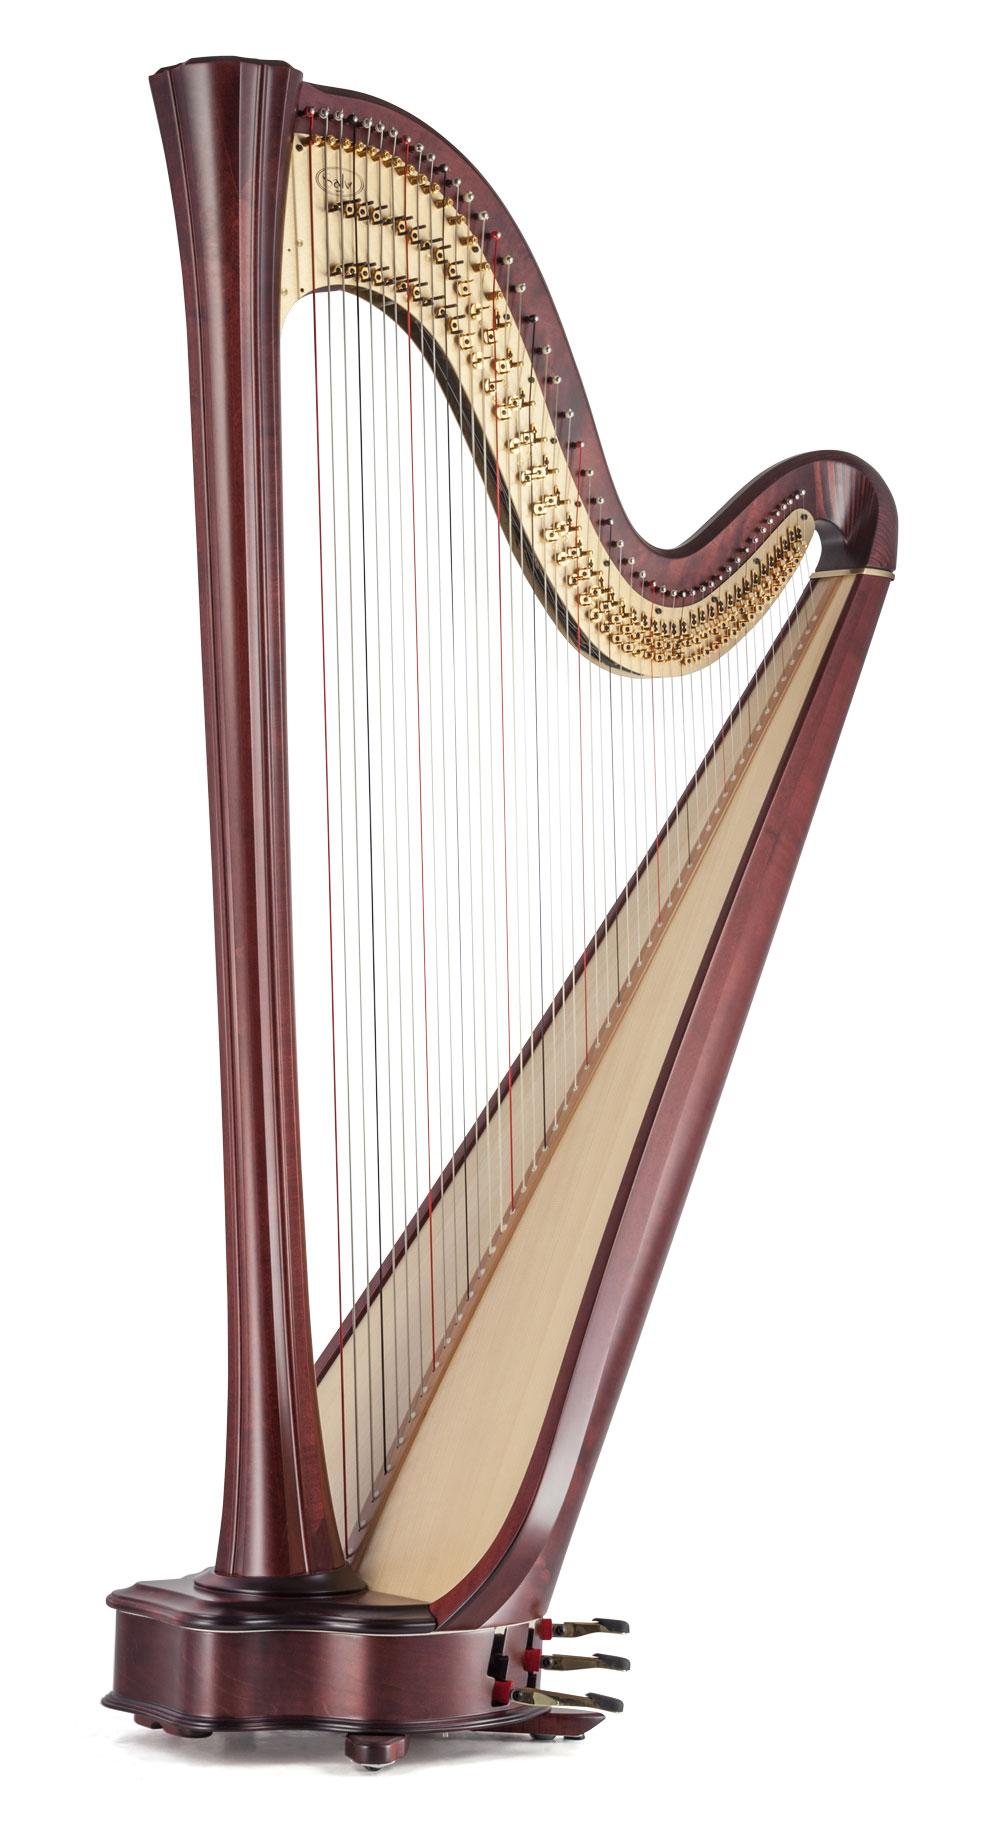 Daphne 47 EX - Arpa Student Pedal - Salvi Harps